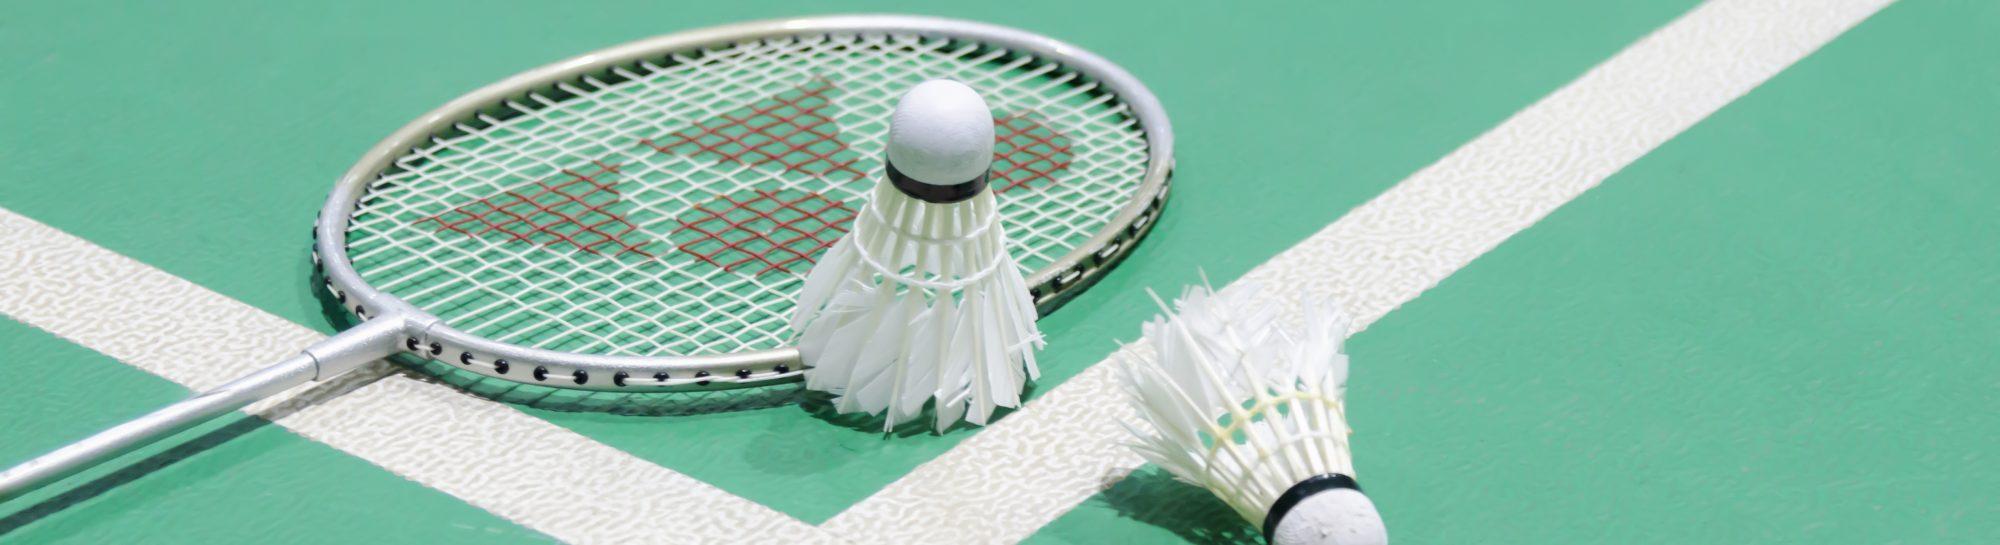 Badminton Club Wachtberg - 1977